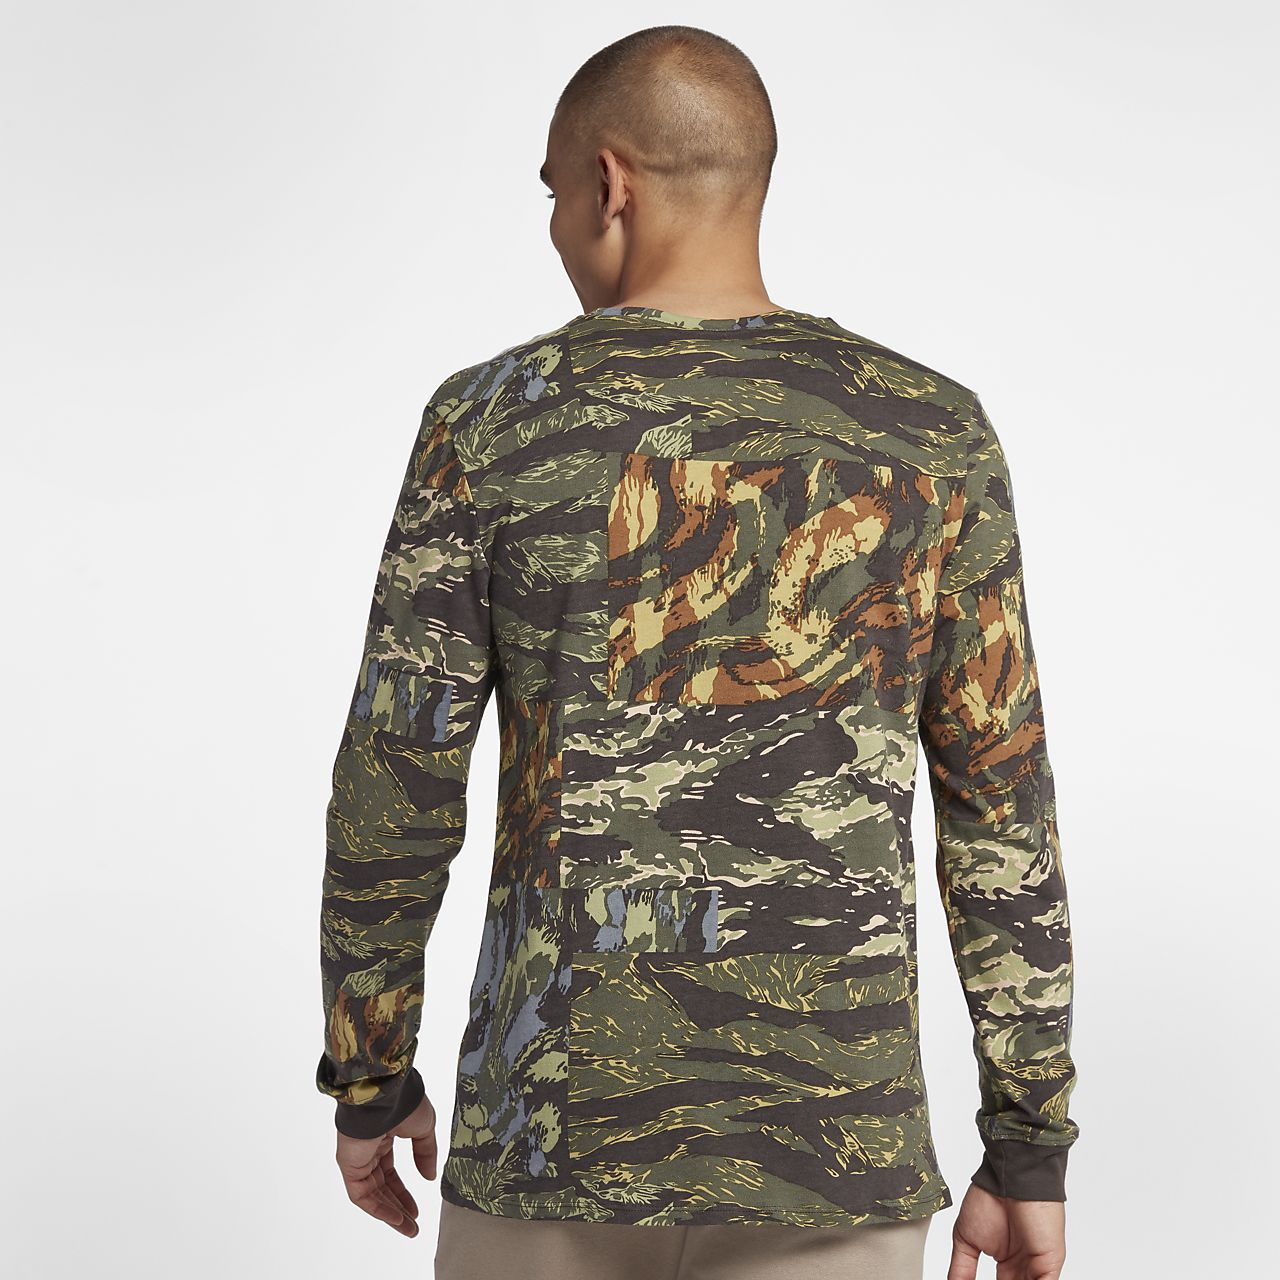 1a0ed4b1c Nike Sportswear Men's Printed T-Shirt. Nike.com